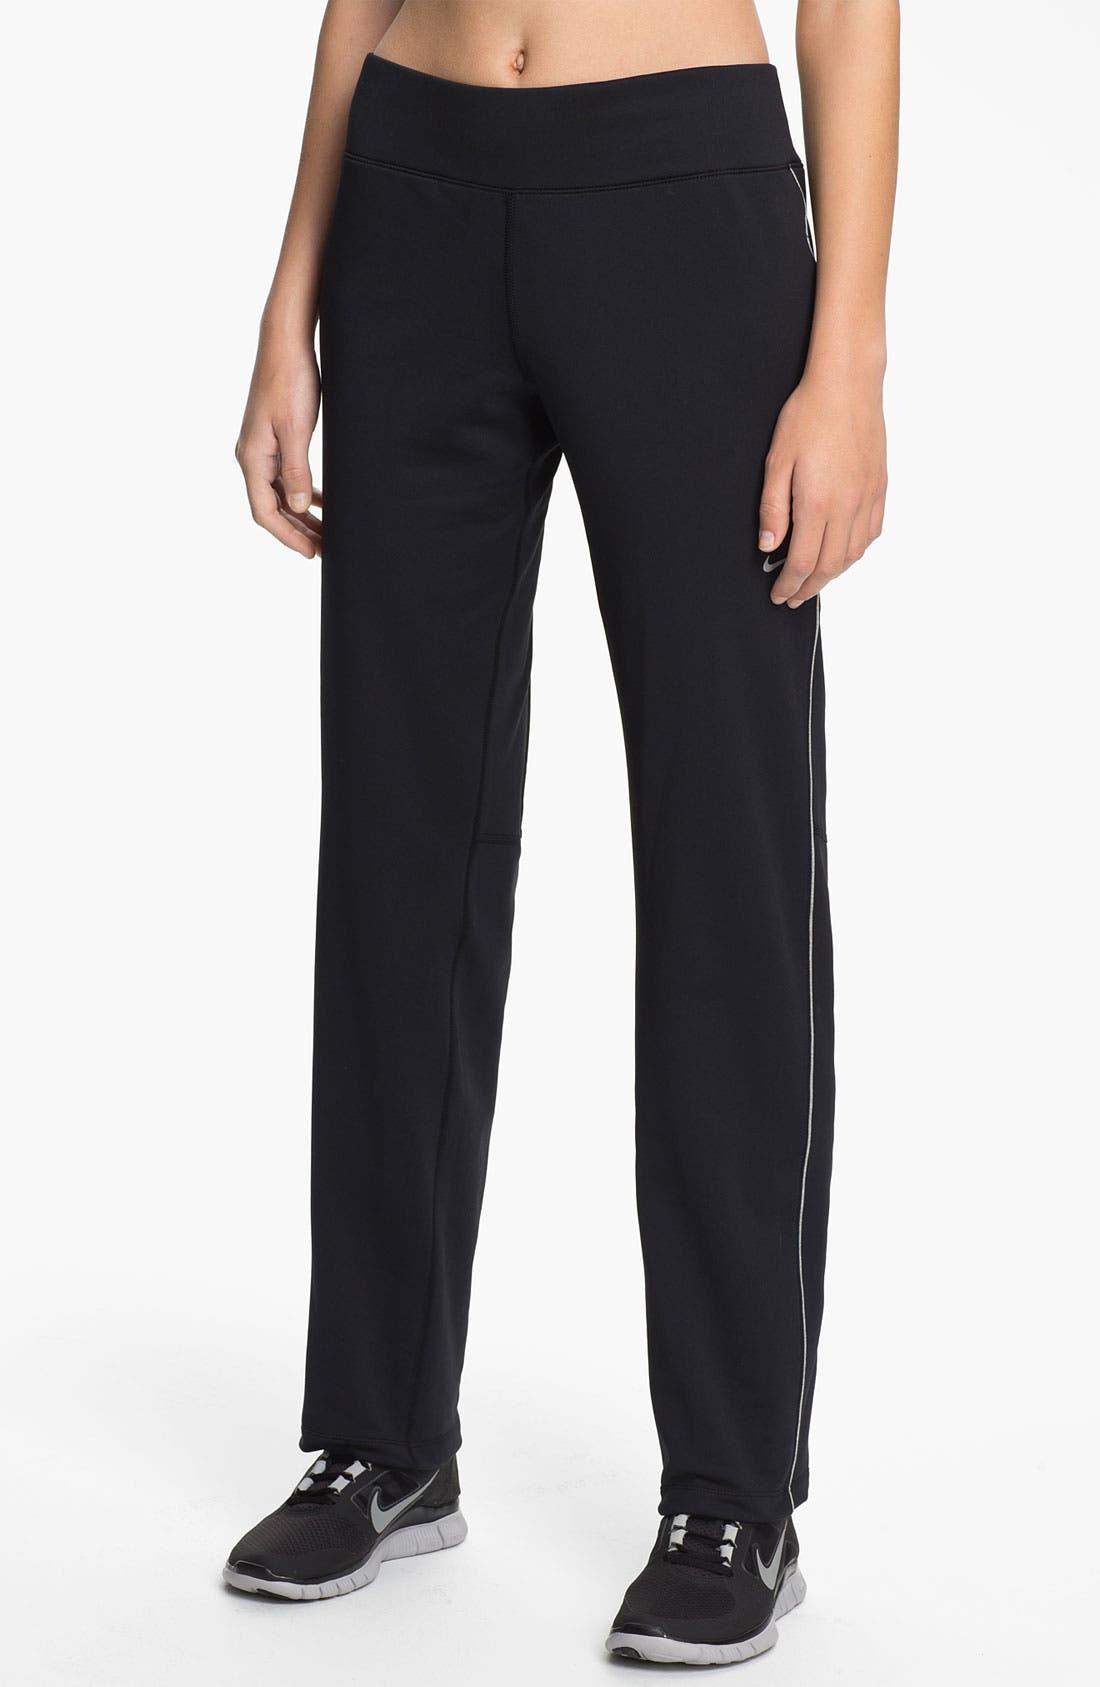 Alternate Image 1 Selected - Nike Thermal Running Pants